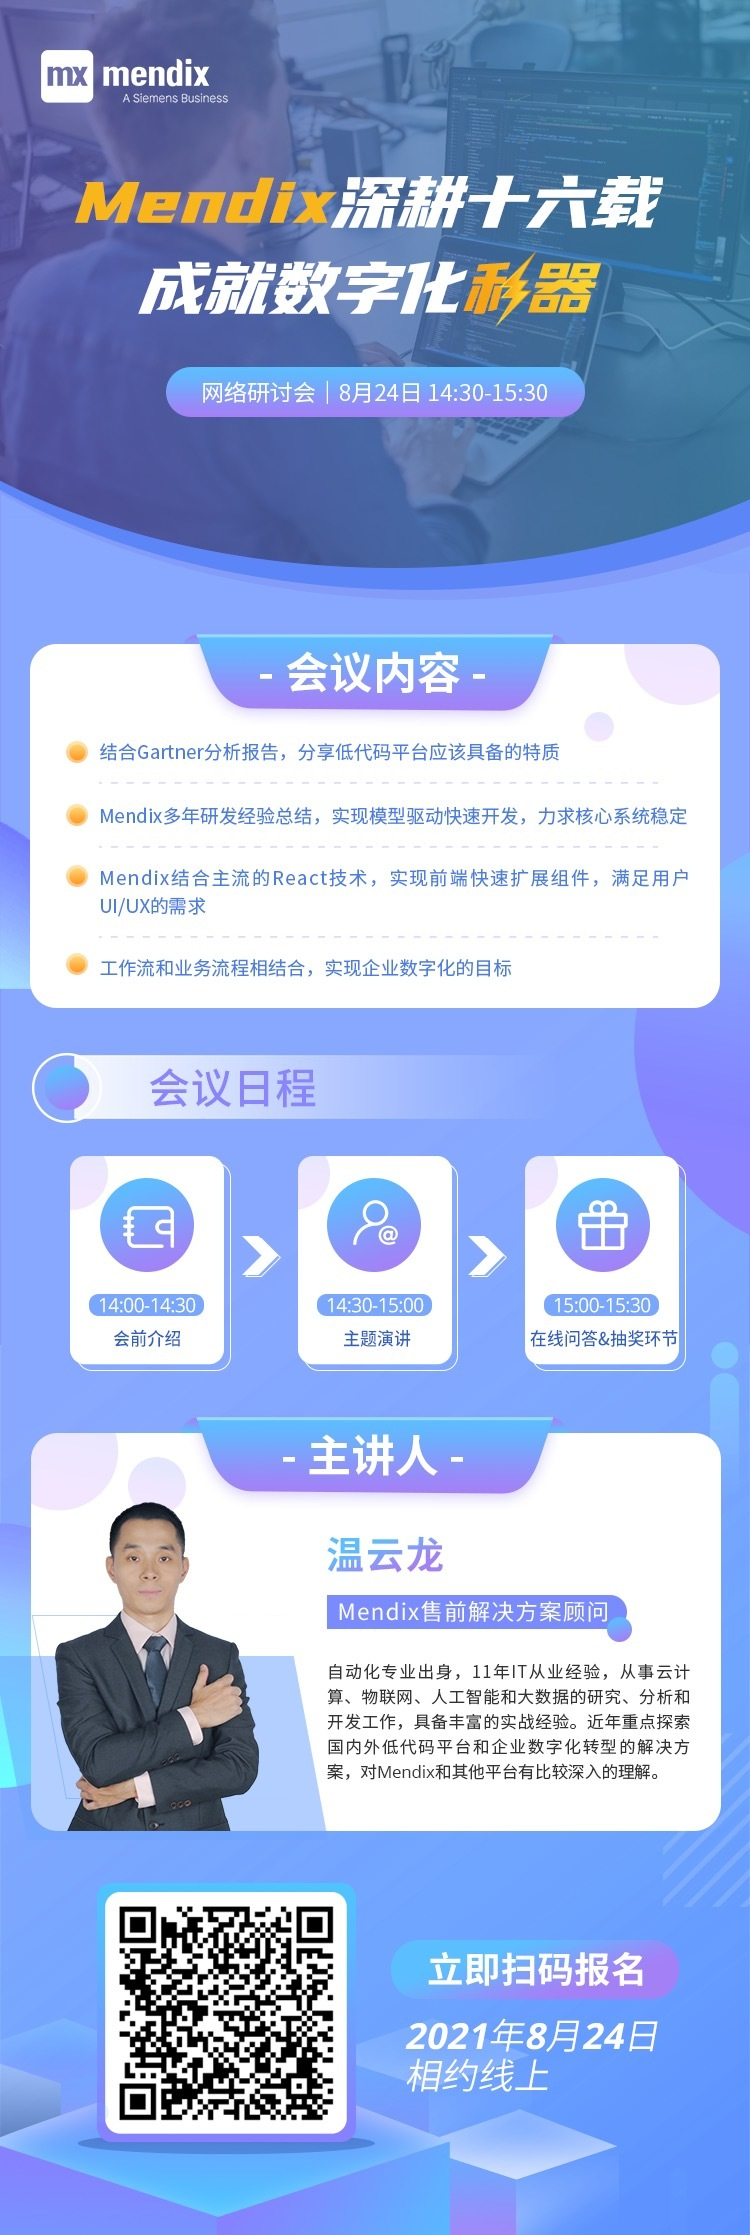 Webinar poster 0824 for WeChat.jpg